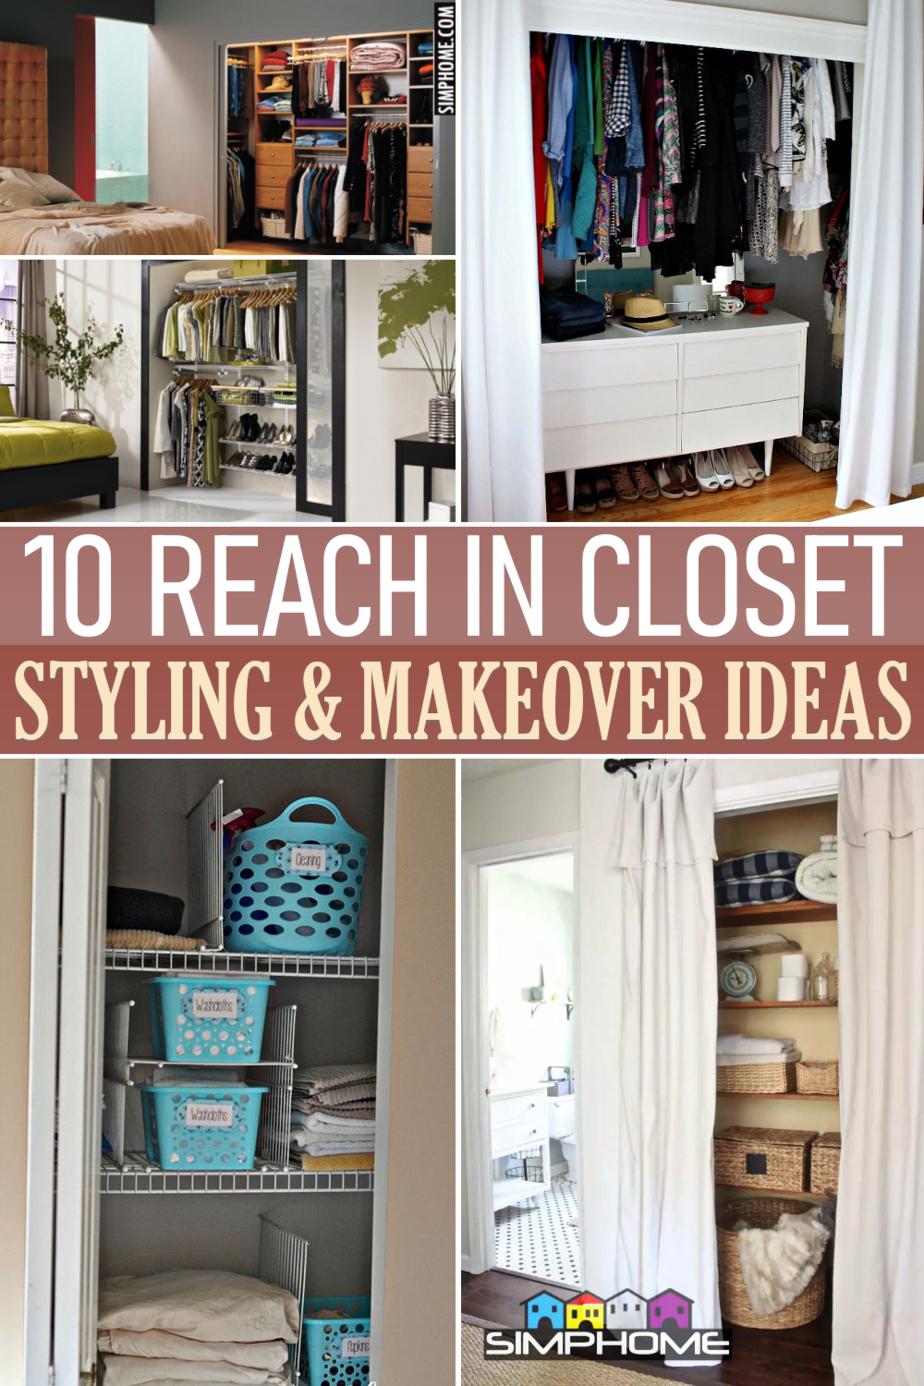 10 Reach in Closet Ideas via Simphome.comFeatured